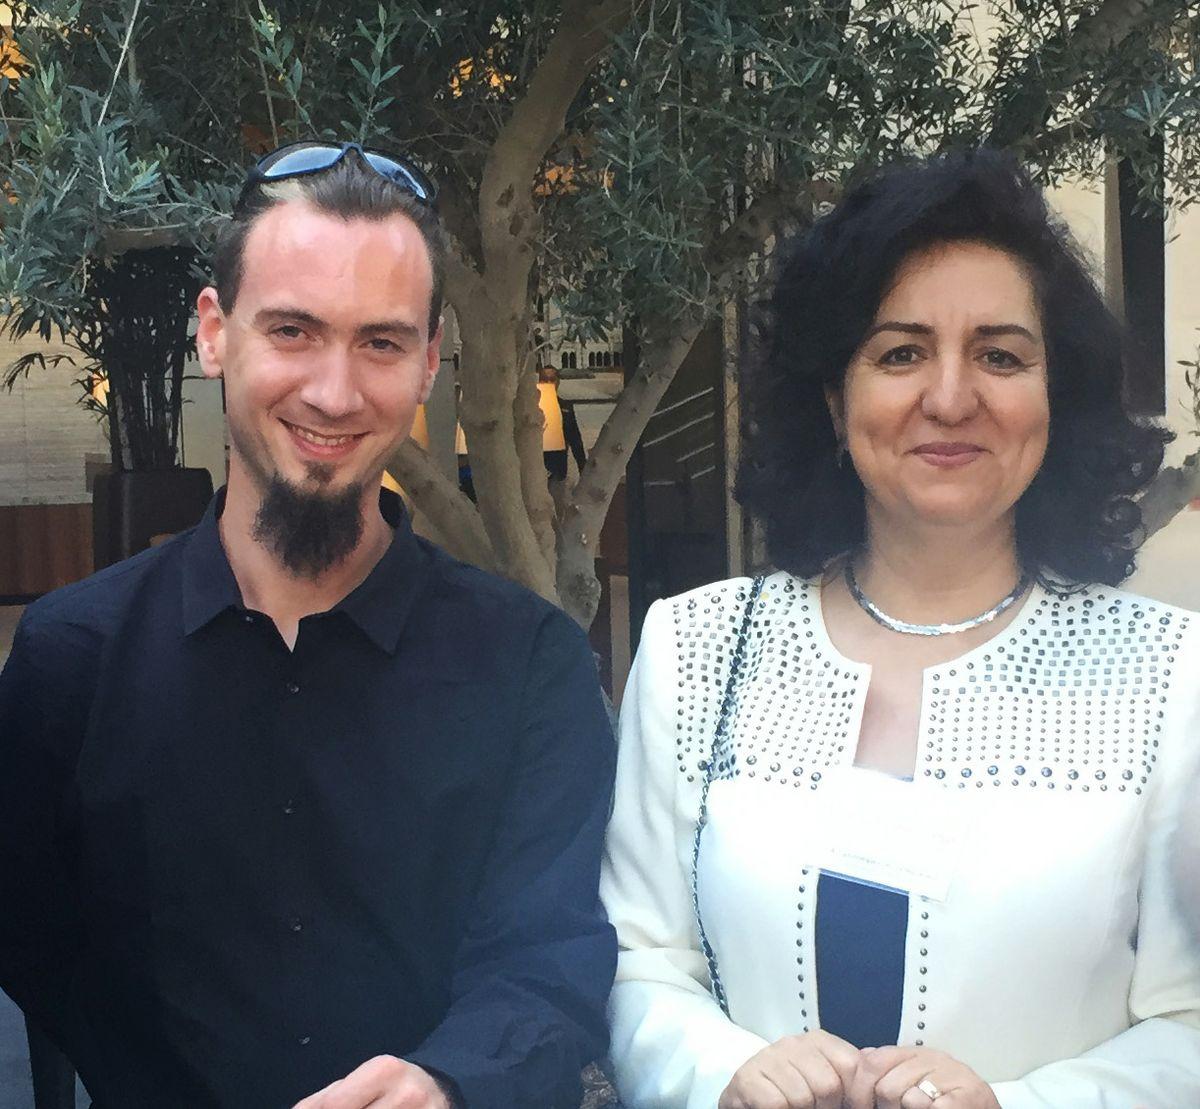 Gregoire Ruffenach and Mansoureh Eghbali